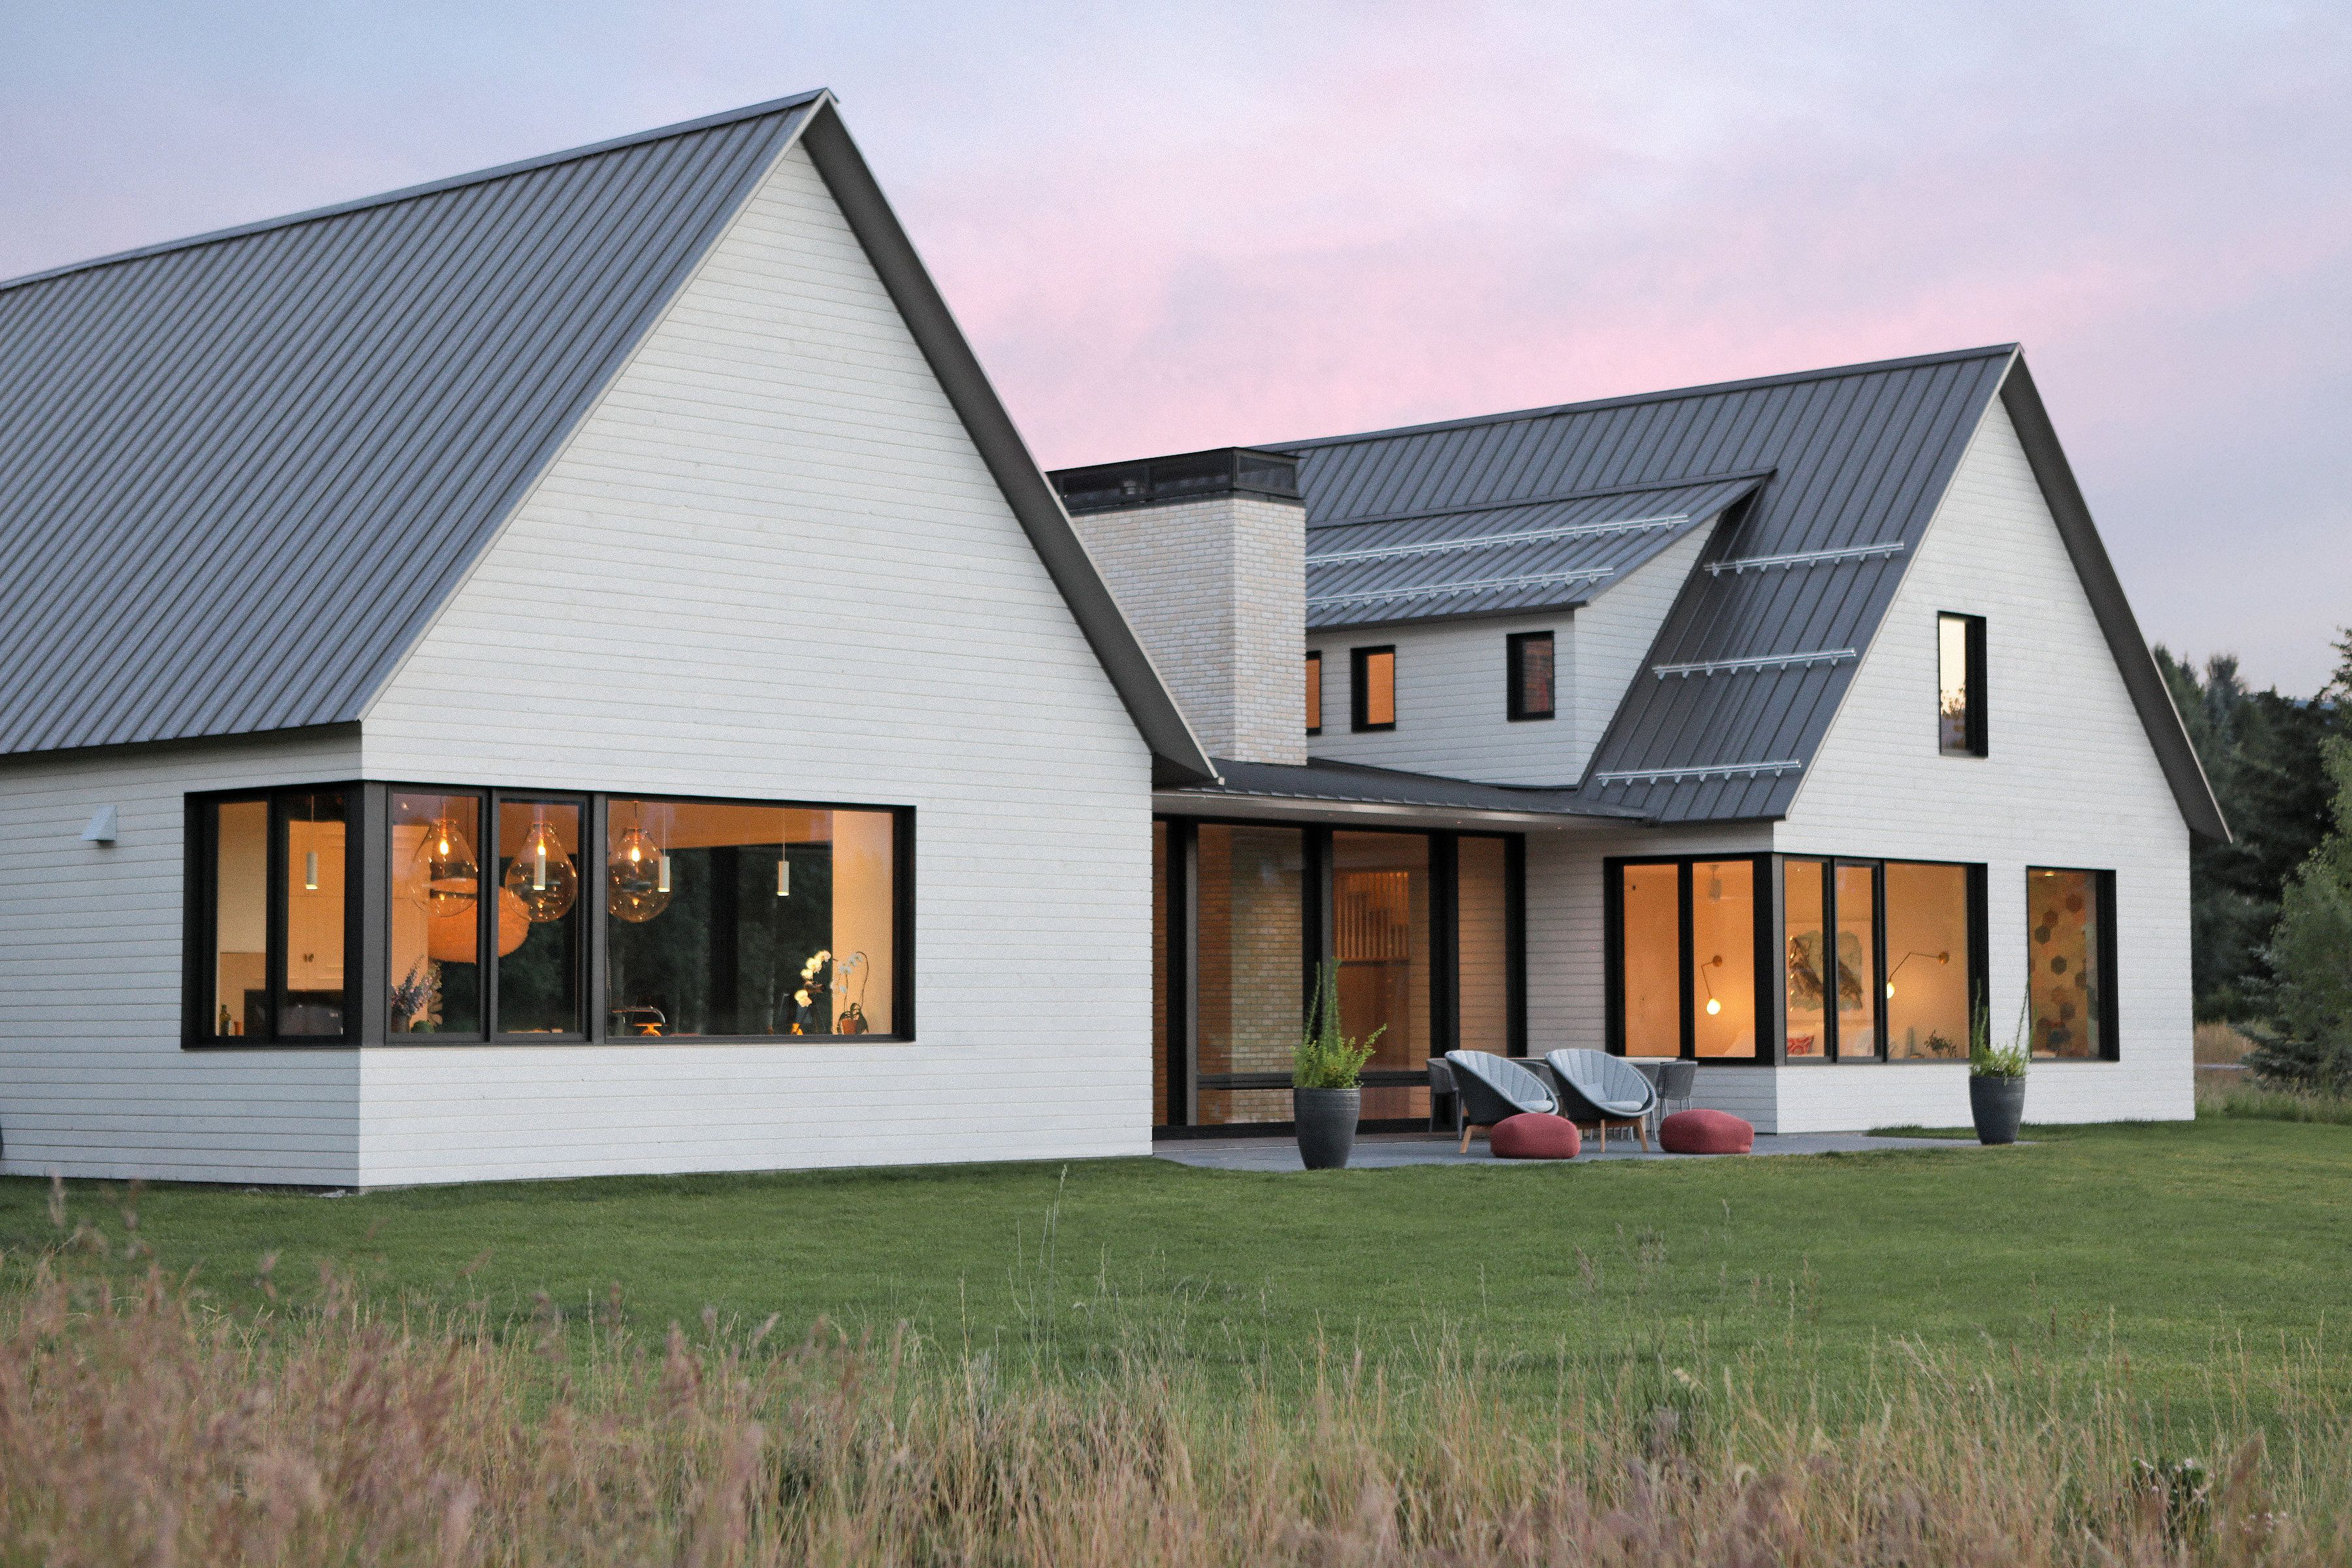 Modern Farmhouse Exterior Modern Farmhouse Exterior Contract Interior Design Modern Farmhouse Design